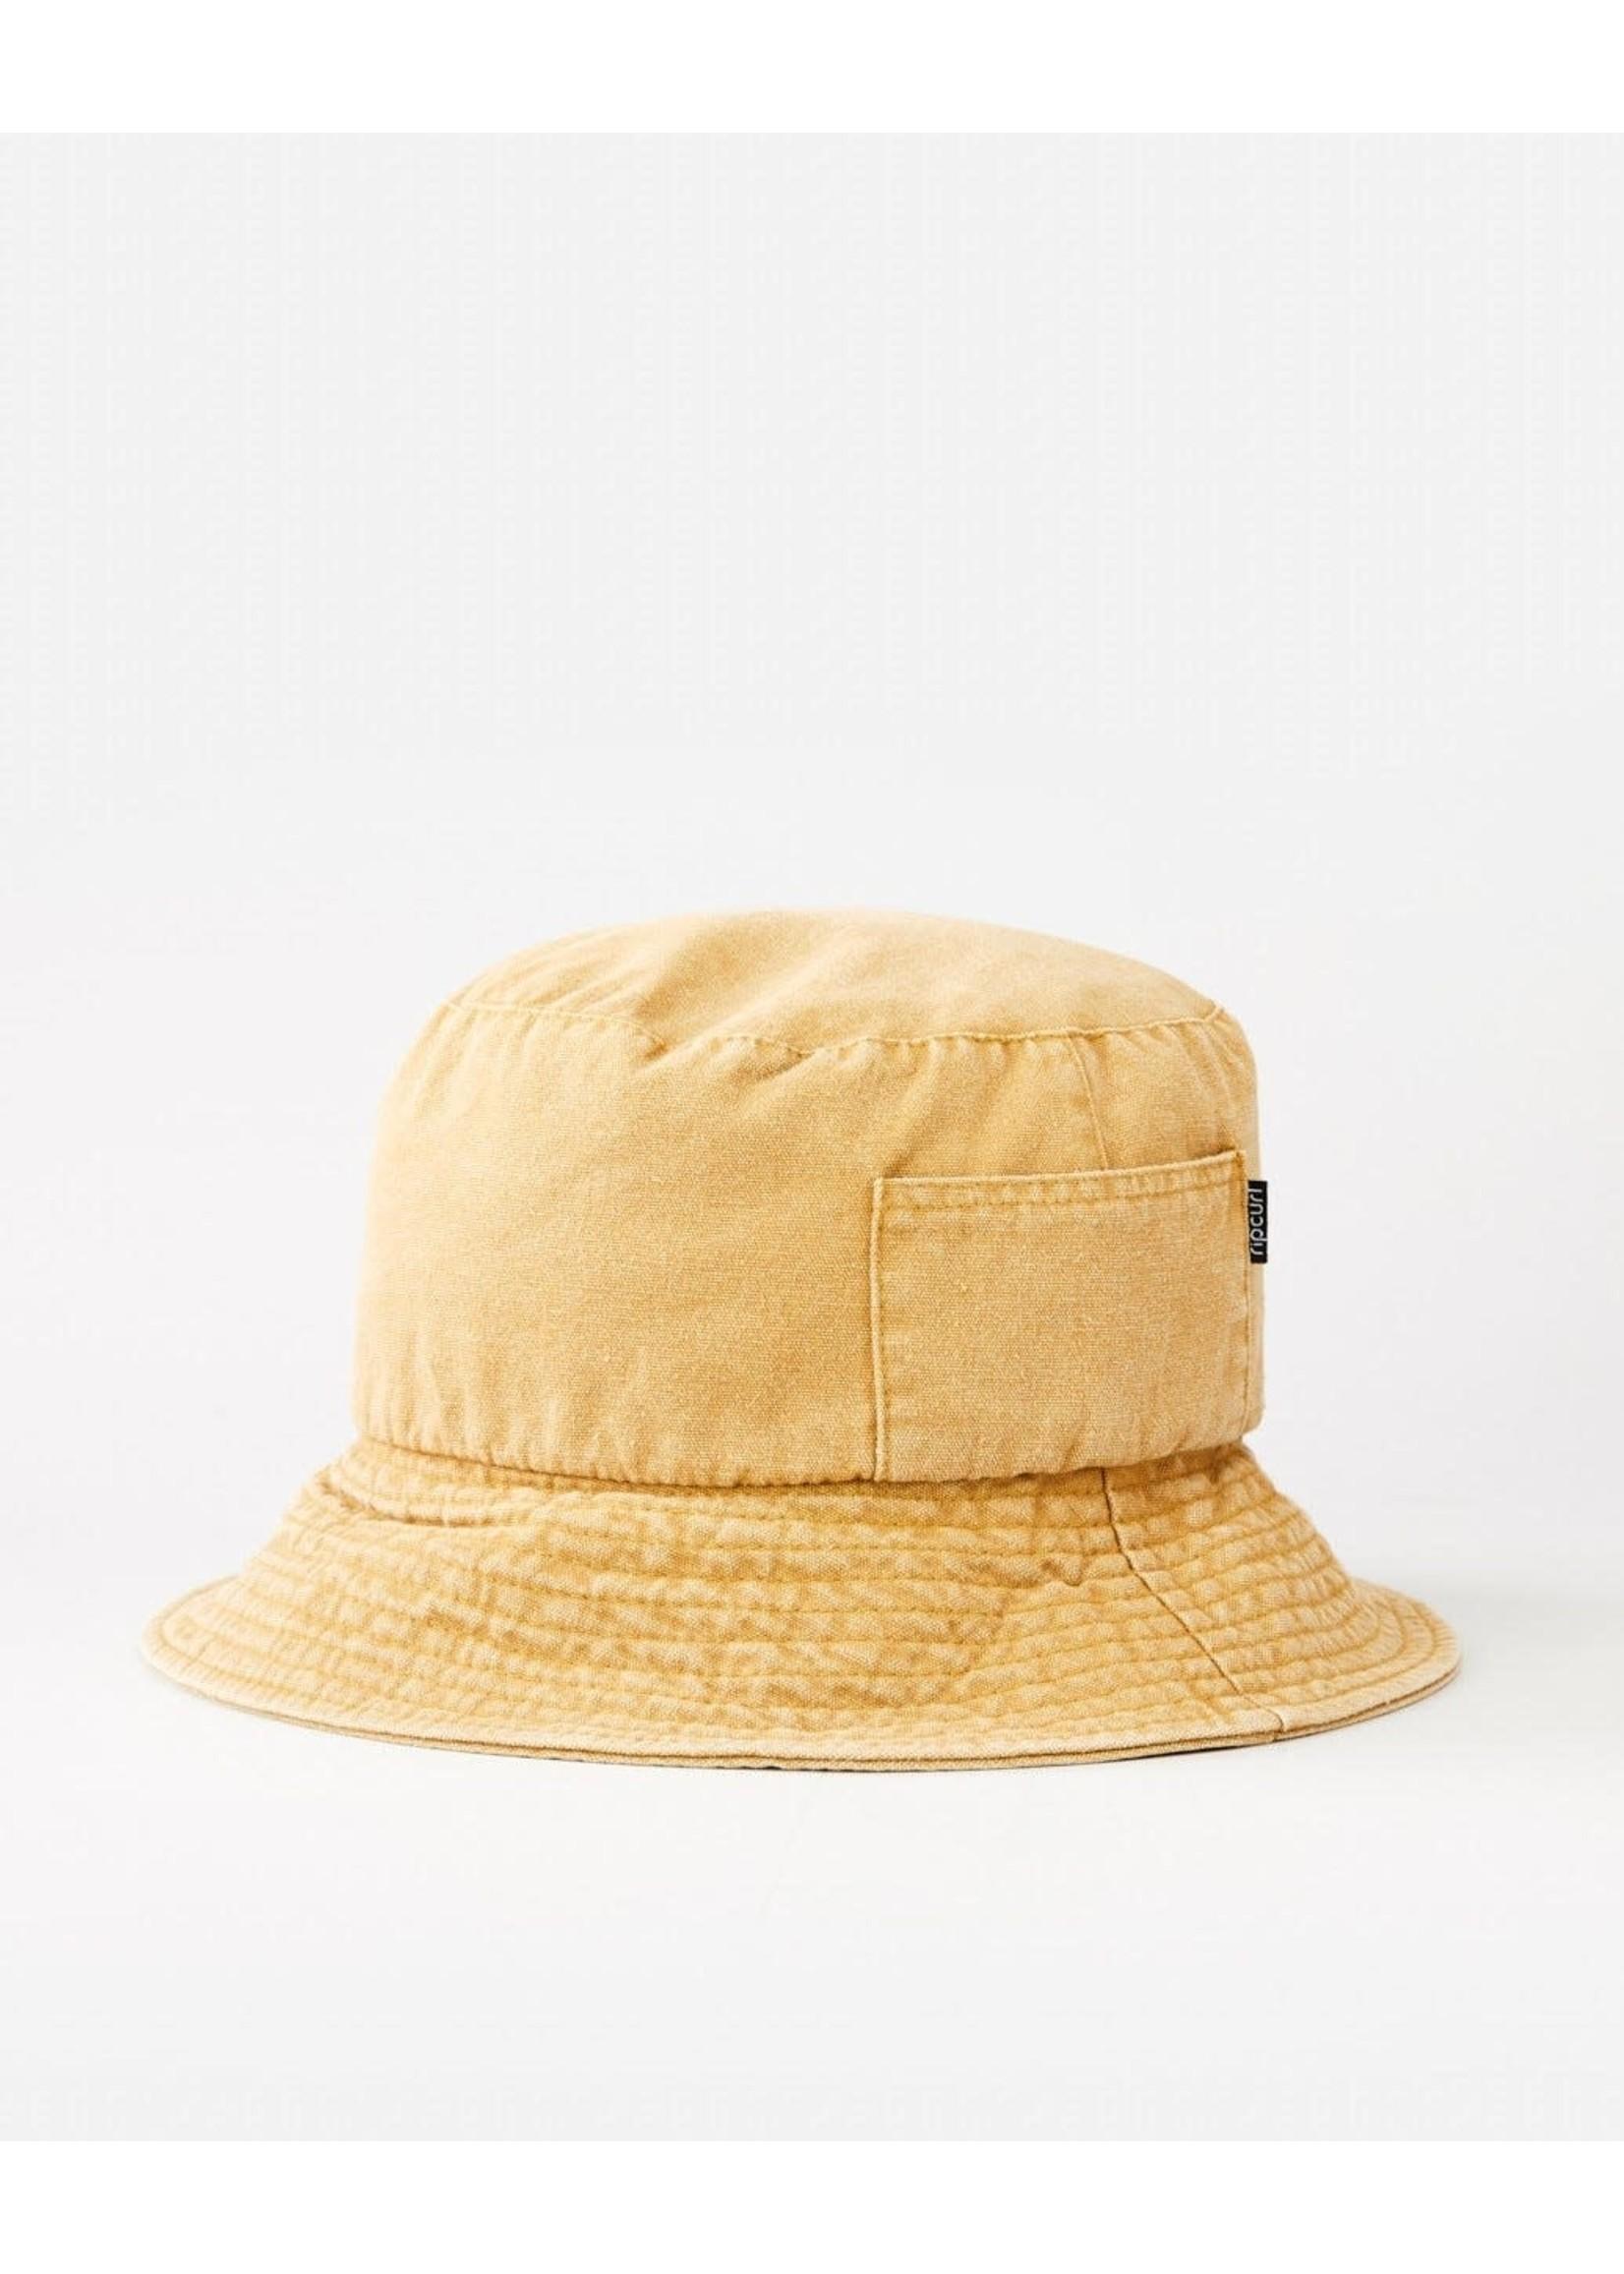 Ripcurl Ripcurl Washed Bucket Hat